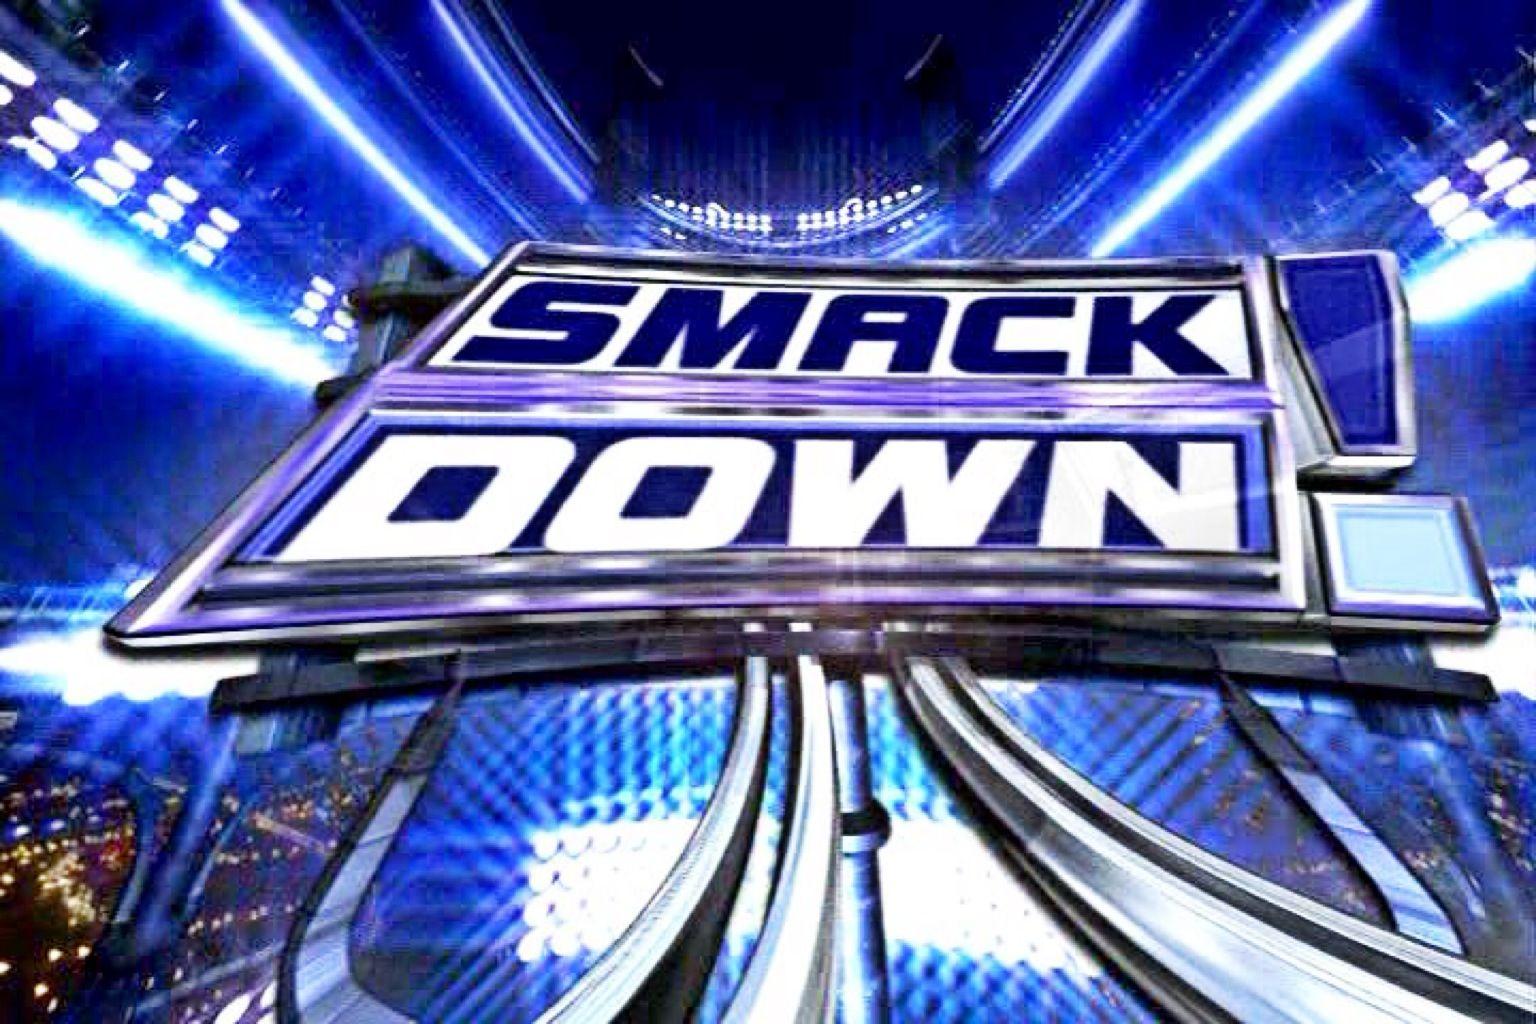 WWE FRIDAY NIGHT SMACKDOWN WAS SUPER PHENOMENAL!  I LIKED THE MATCH OF ROMAN REIGNS JOHN CENA AND  SHEAMUS VS ANTONIO CESARO RANDY ORTON BRAY WYATT AND  ALBERTO DEL RÍO   ROMAN REIGNS, JOHN CENA AND SHEAMUS WON THE MATCH!  WWE RULES!